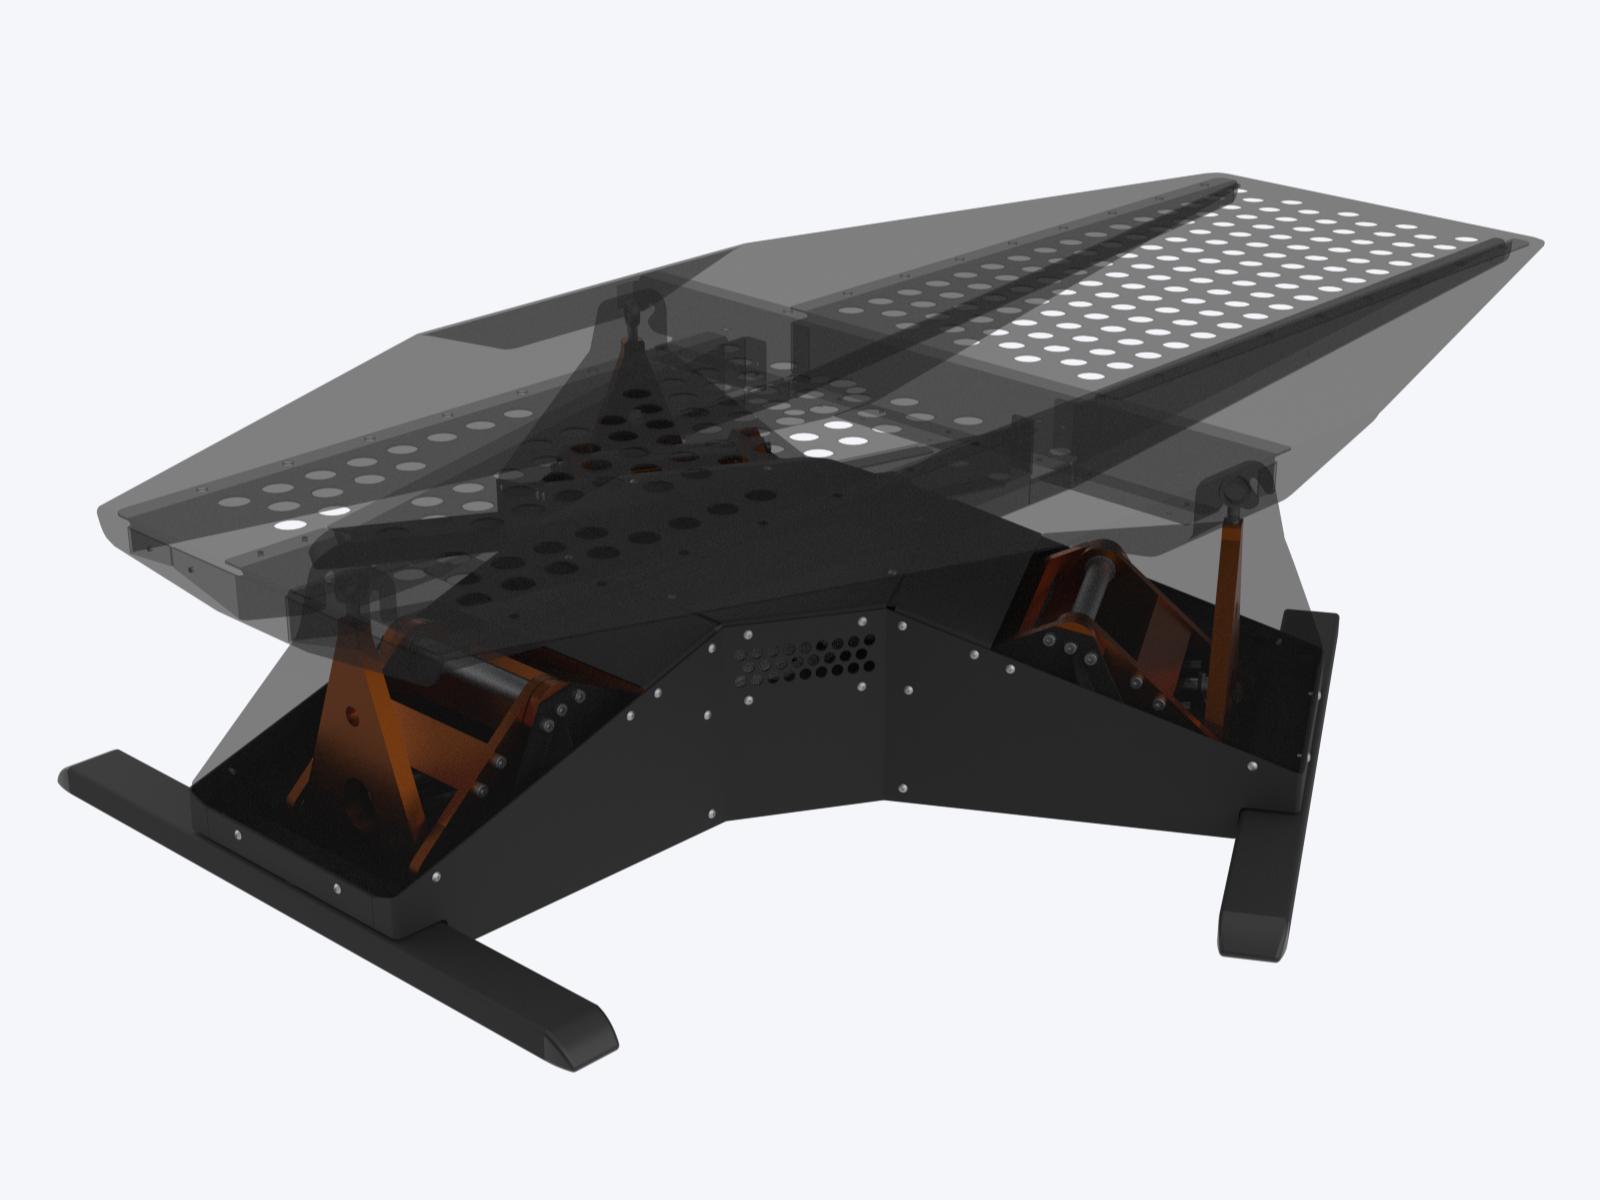 3-DoF Motion Platform